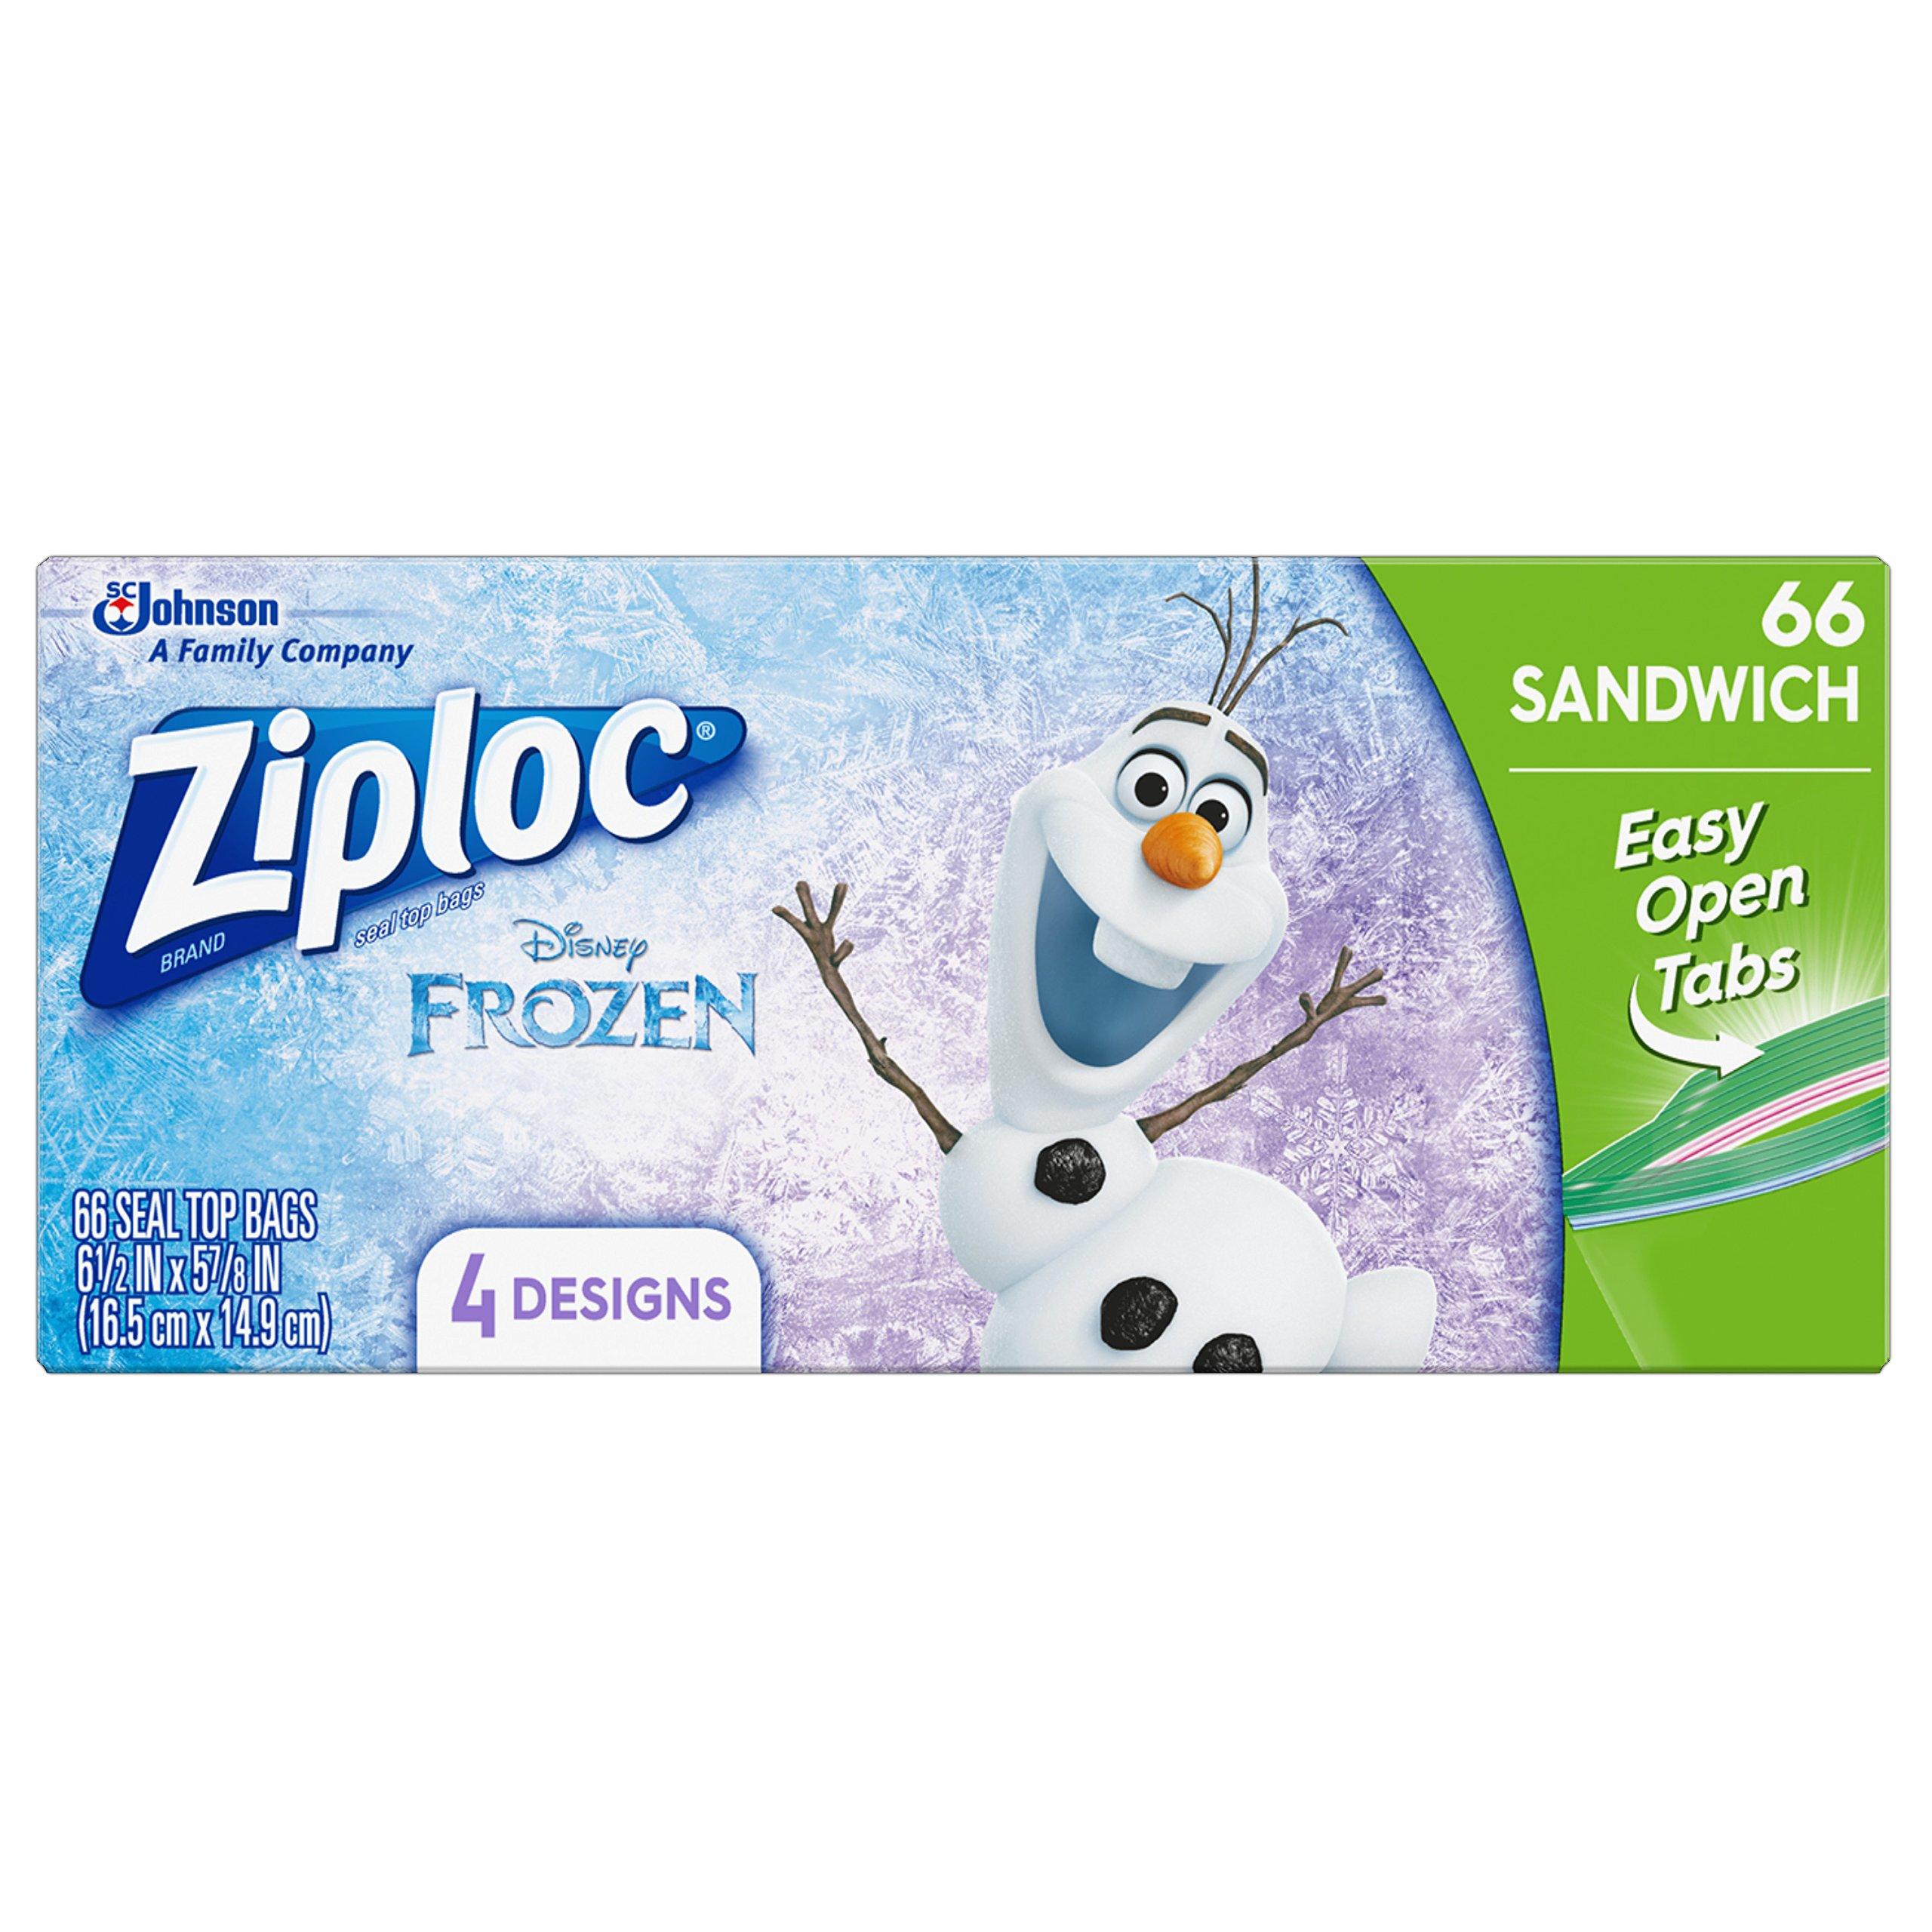 Amazon.com: Ziploc Brand Sandwich Bags featuring Disney Frozen Designs, 66 ct: Health & Personal Care